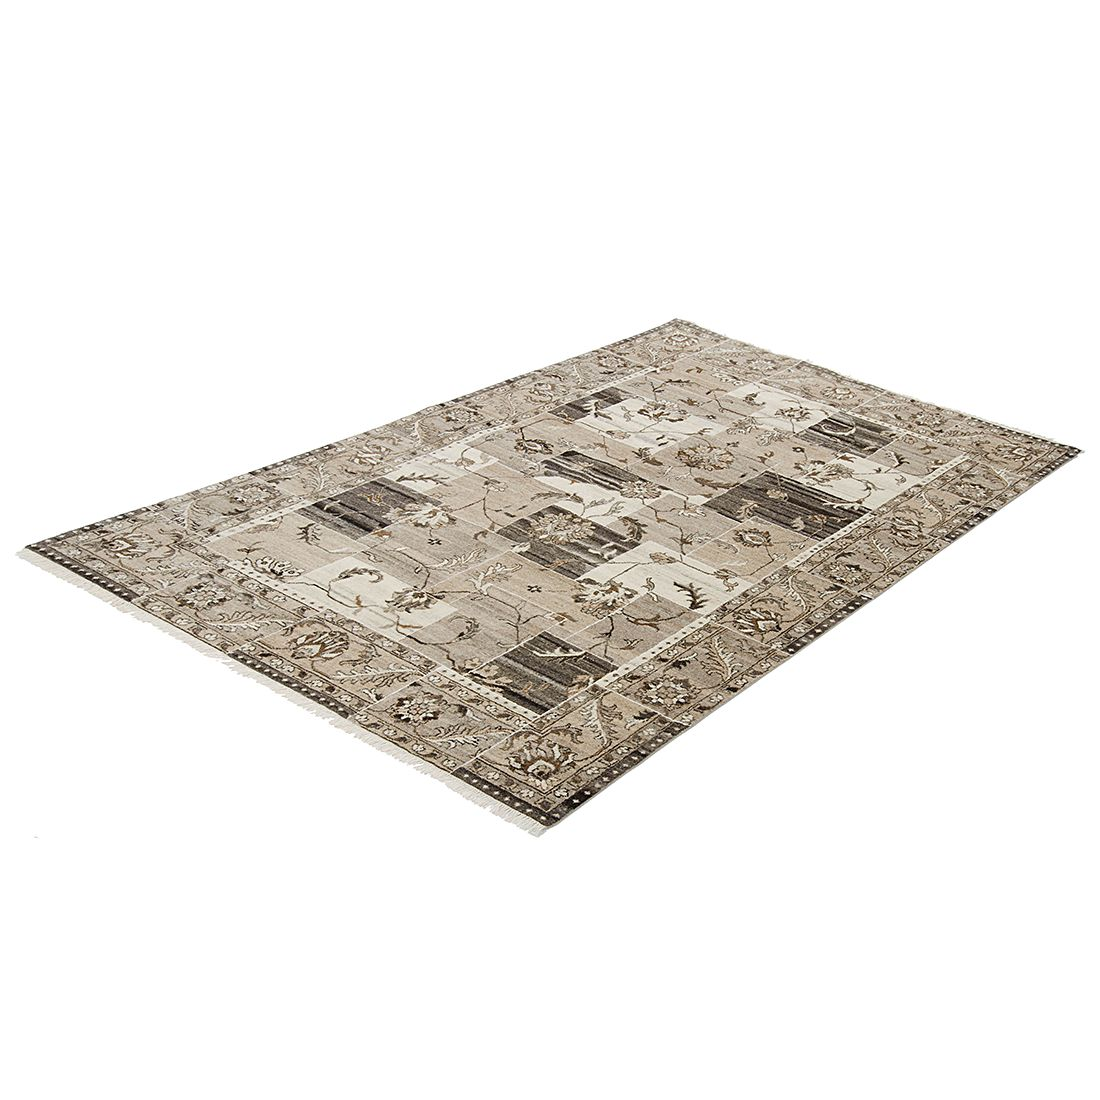 Teppich Irun Patch - Natur - Maße: 200 x 140 cm, Parwis